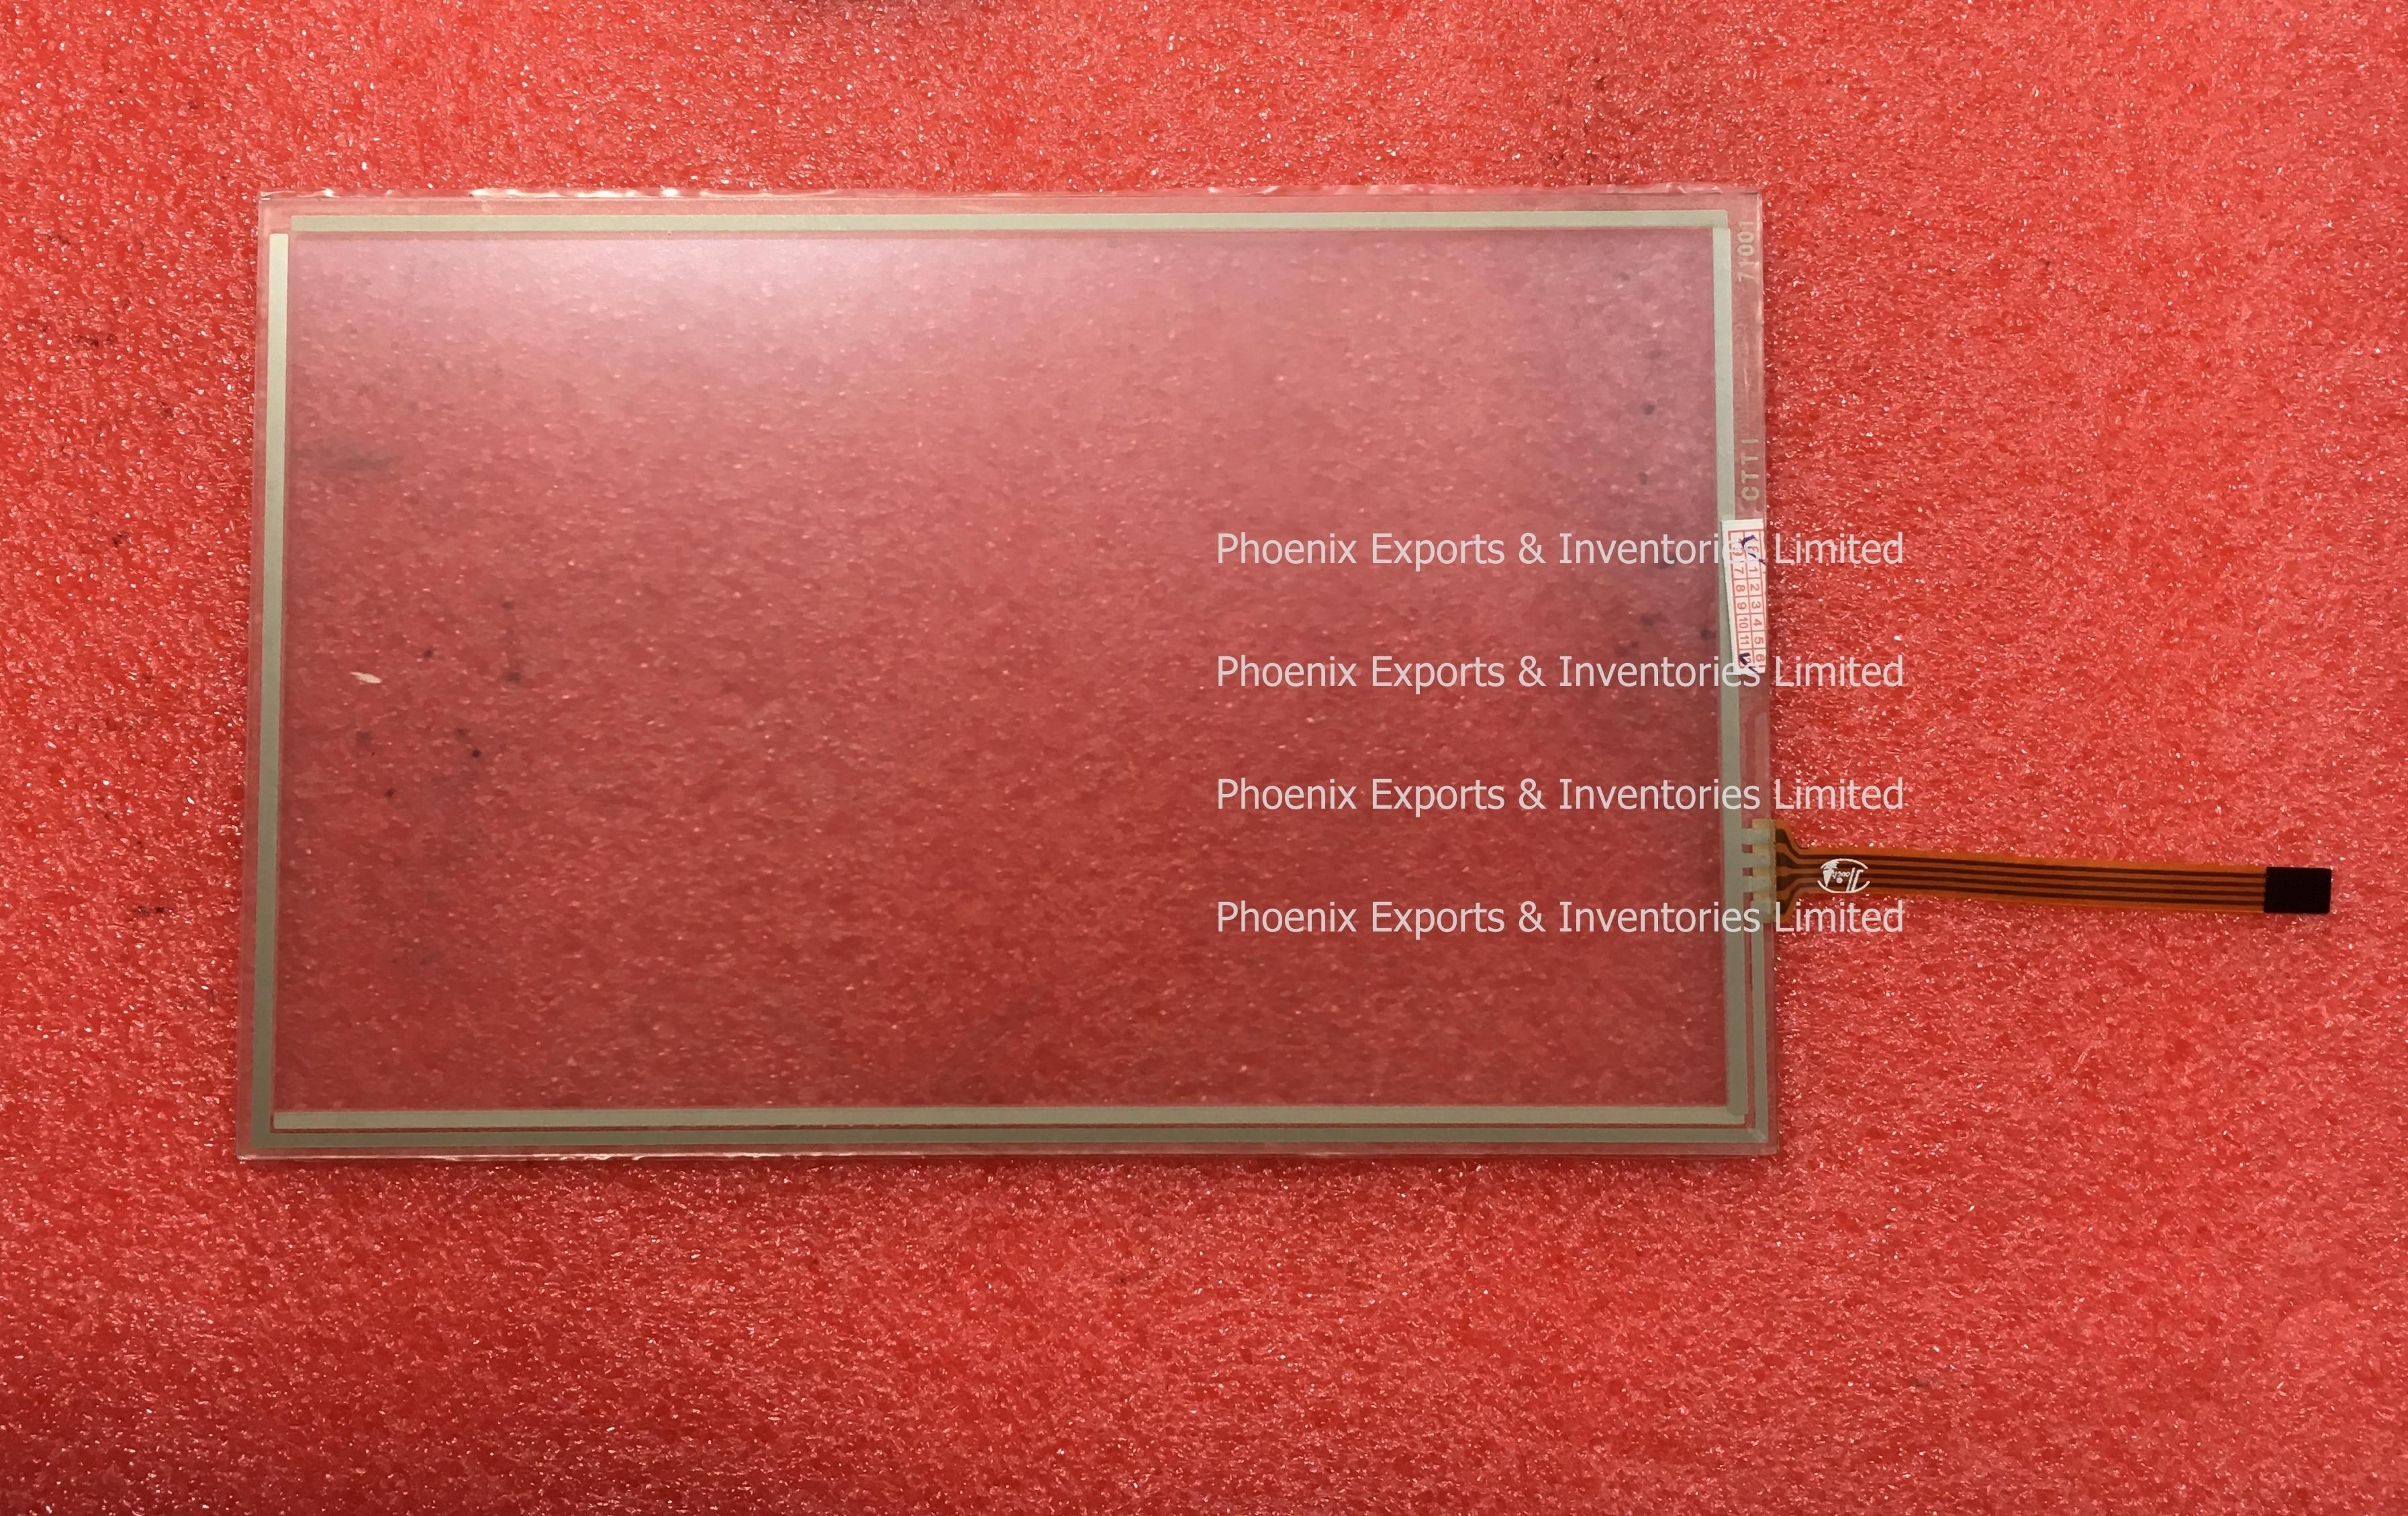 Brand New TS1070I Touch Screen Digitizer for HAKKO TS1070 TS1070i Touch Glass Panel Pad hakko monitouch